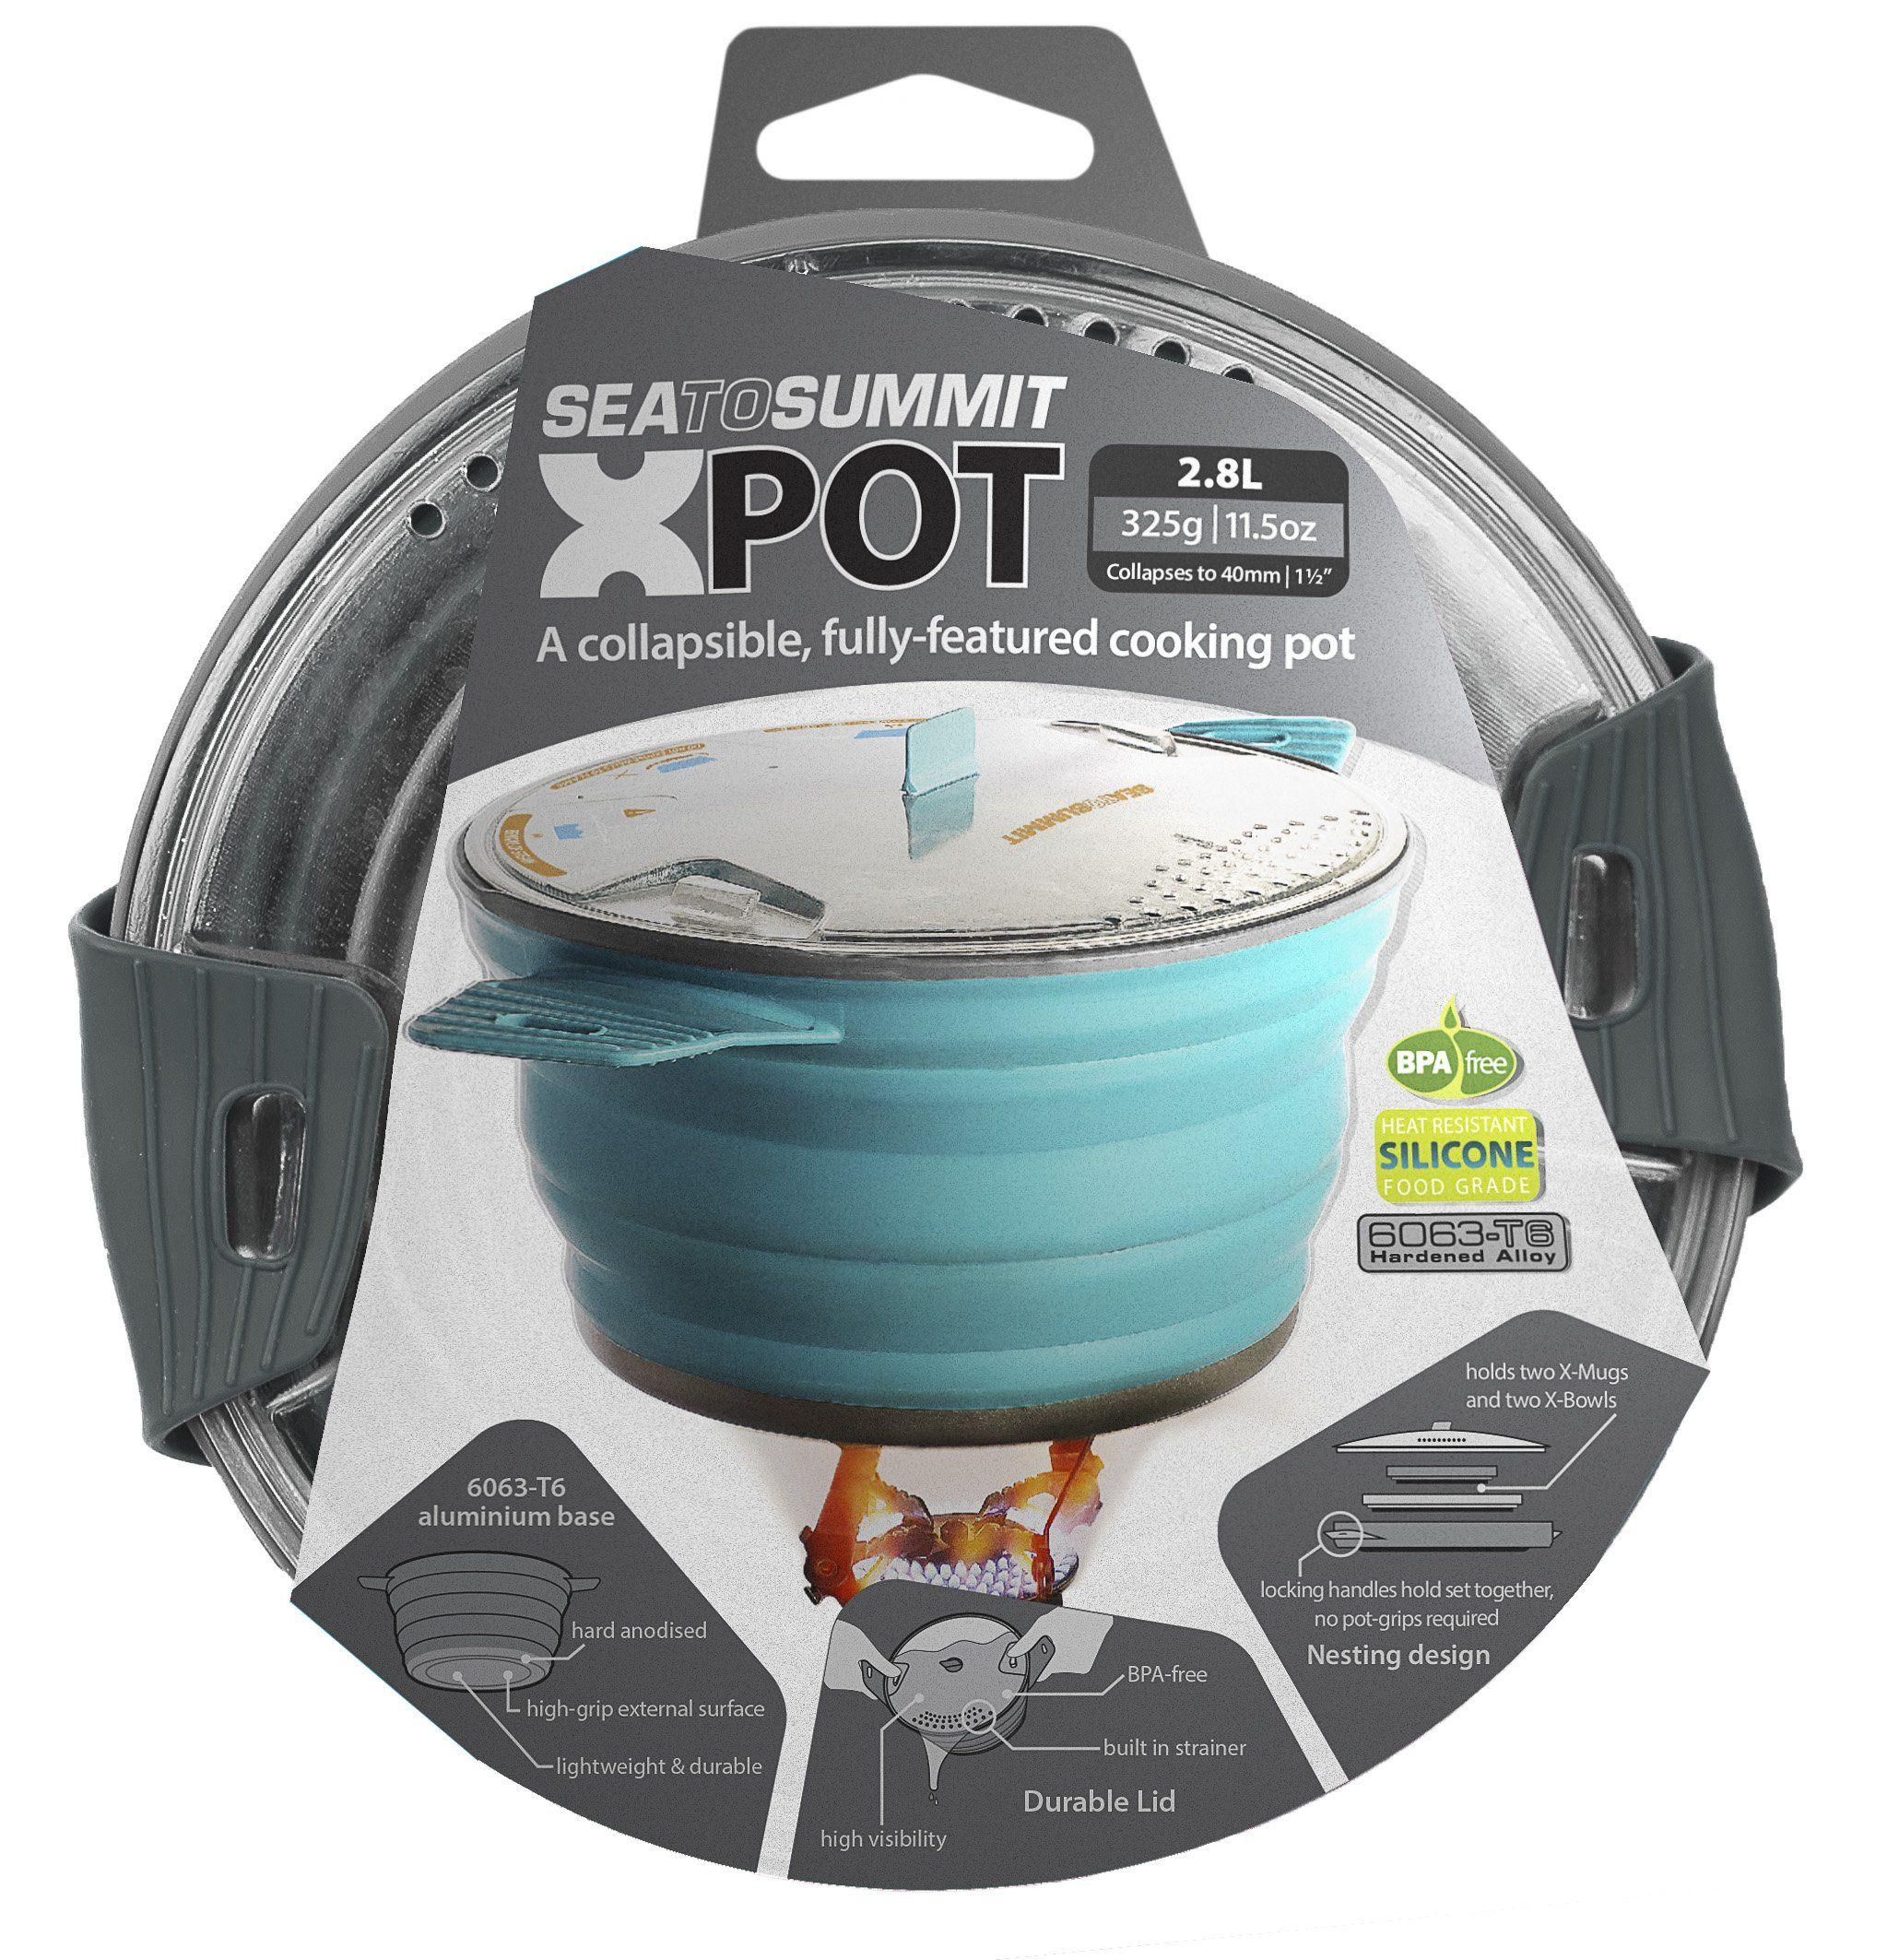 Amazon.com : Sea to Summit 2.8 Liter X-Pot, Pacific Blue, Large ...